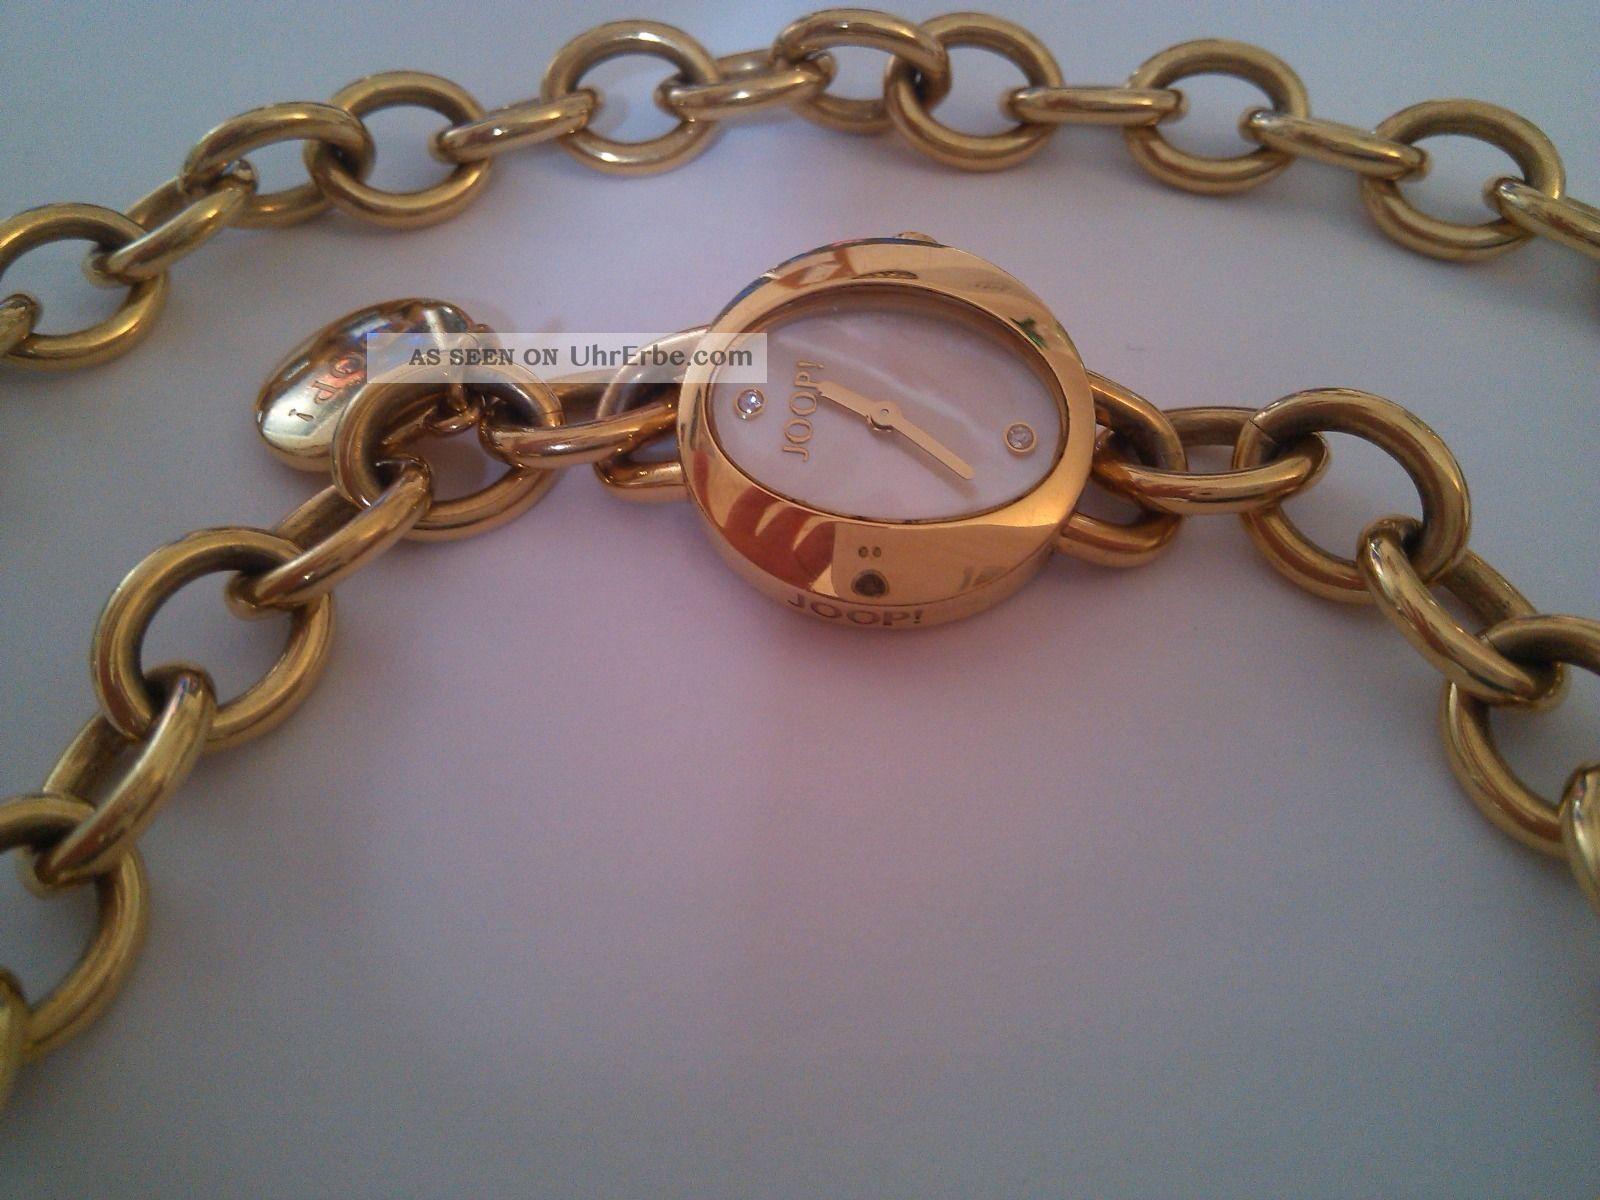 Joop Tl4482 Damenuhr Vergoldet Mit Kette Armbanduhren Bild